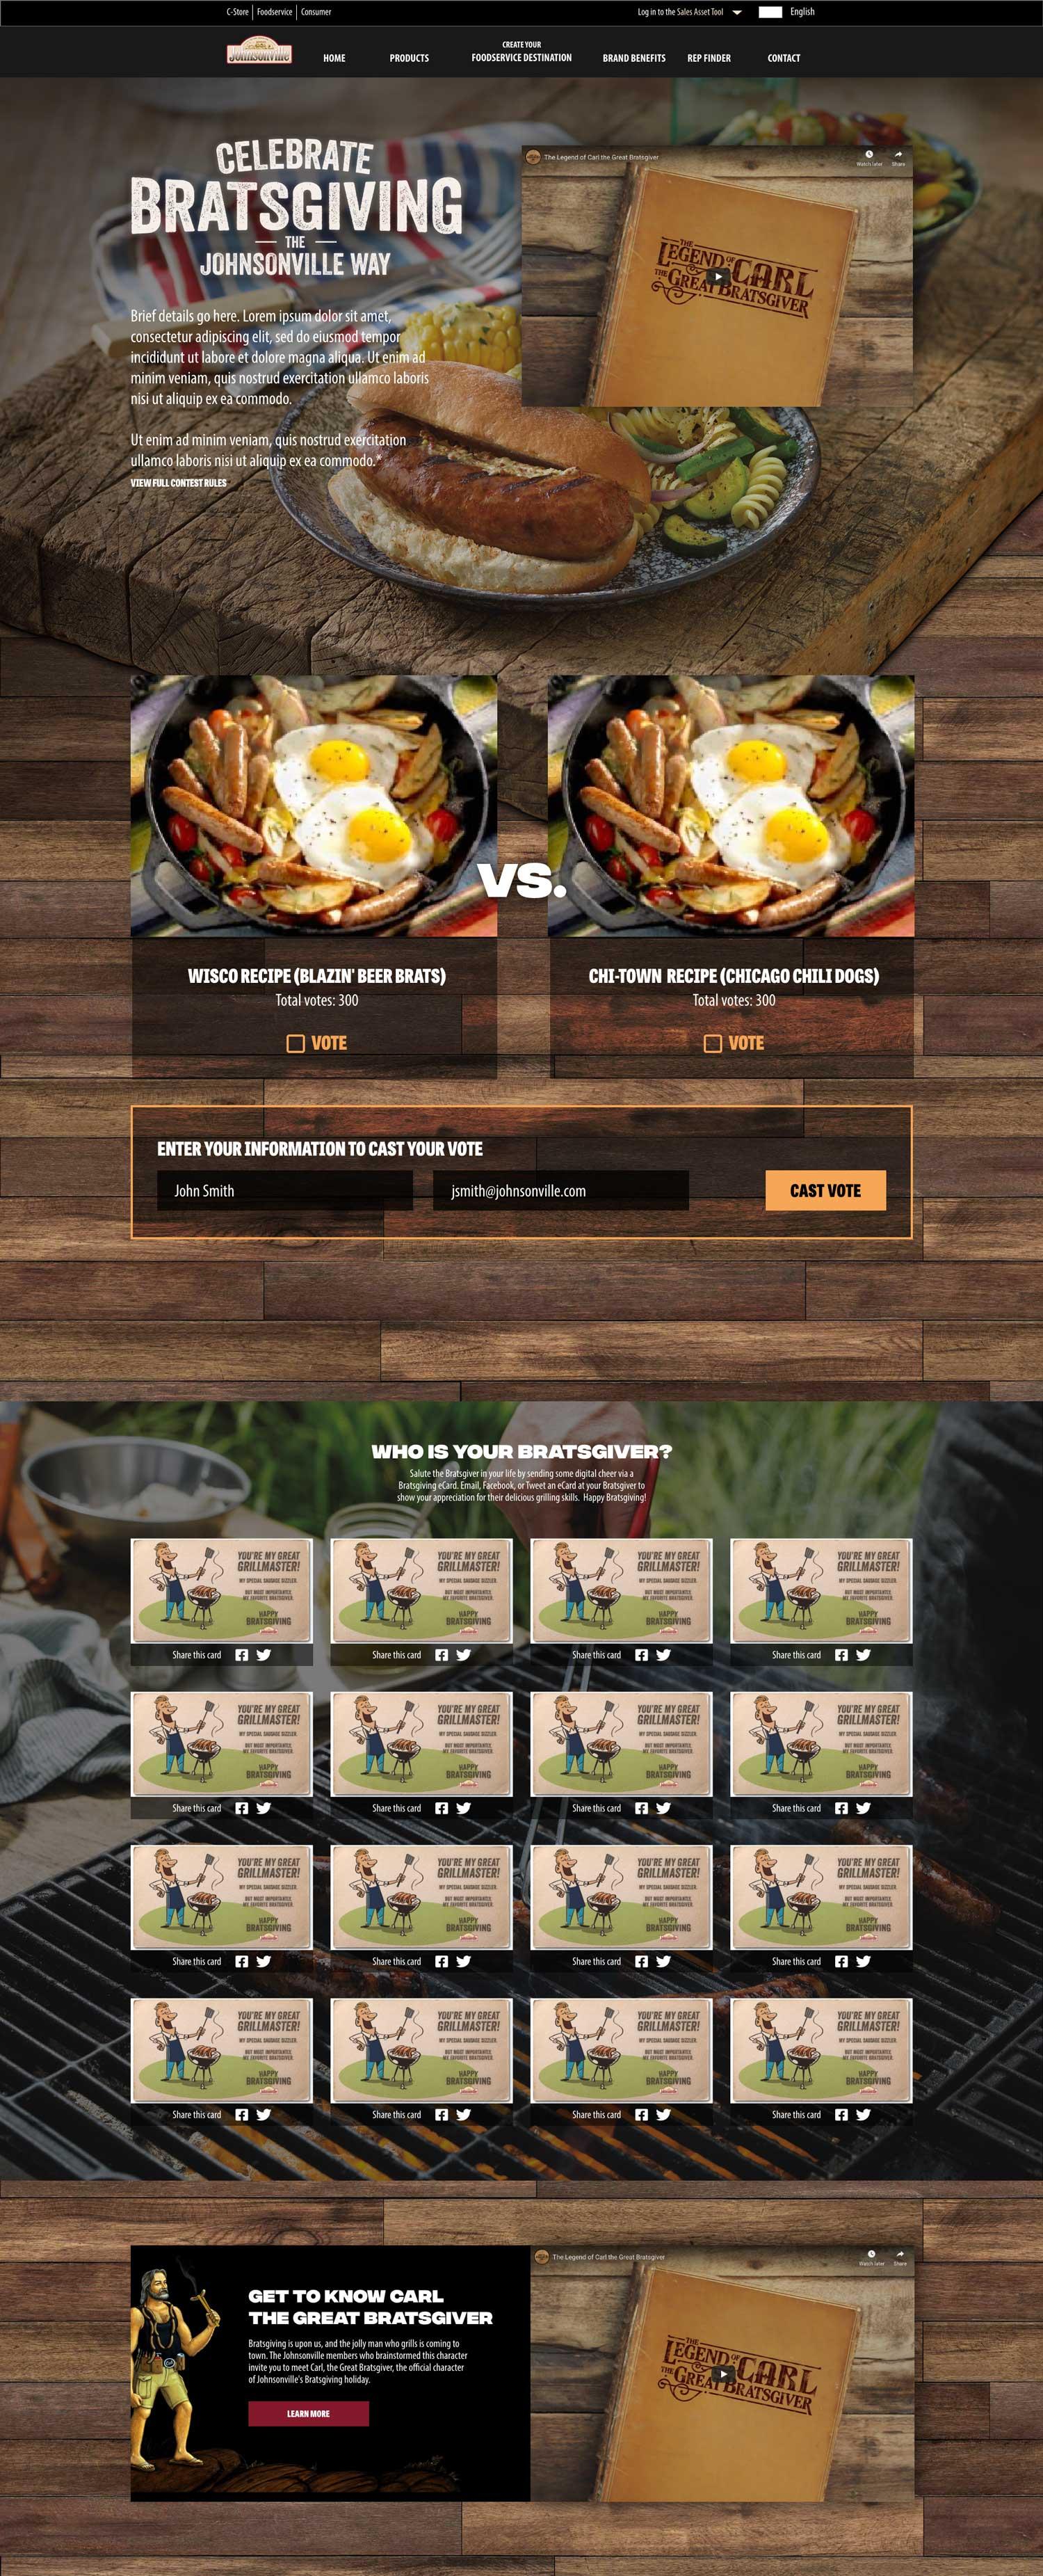 bratsgiving page design